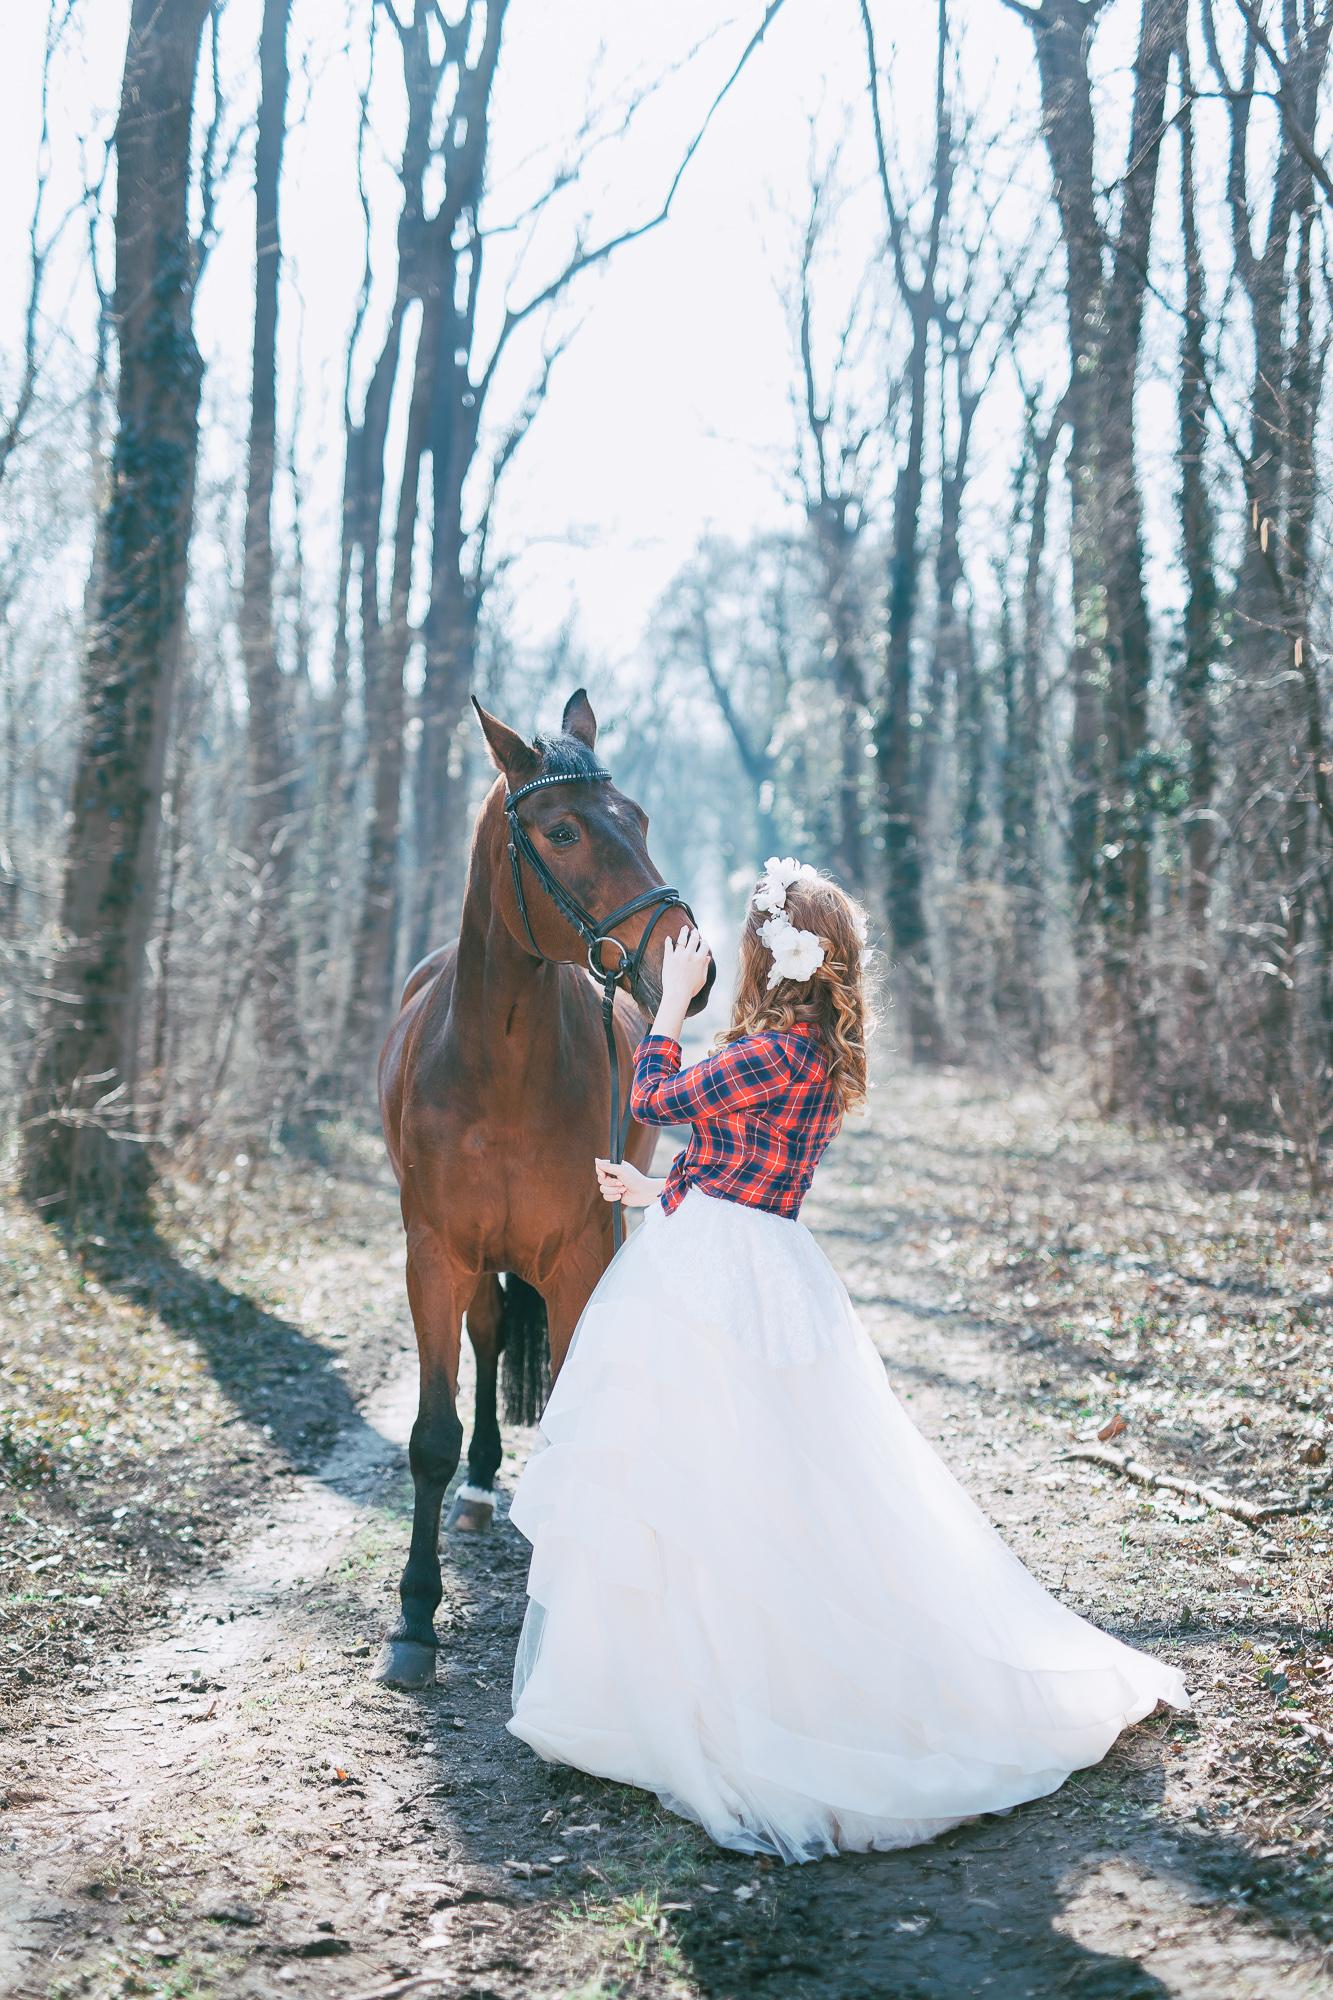 Bridal styled shoot with a horse Metamorphoses by destination wedding planner High Emotion Weddings near Vienna Austria